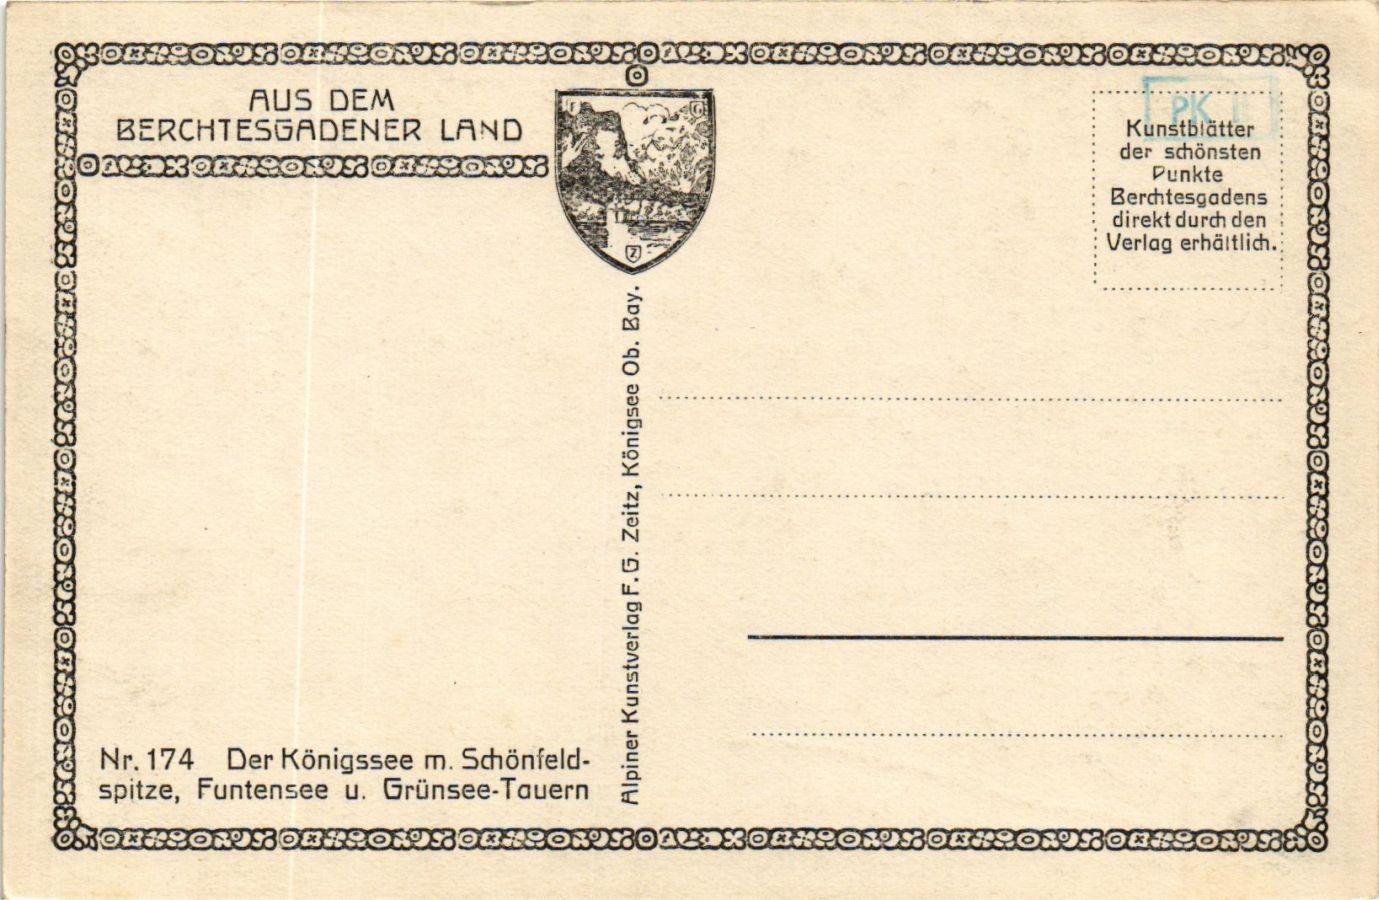 CPA-AK-Konigssee-aus-dem-Berchtesgadener-land-GERMANY-878872 miniature 2